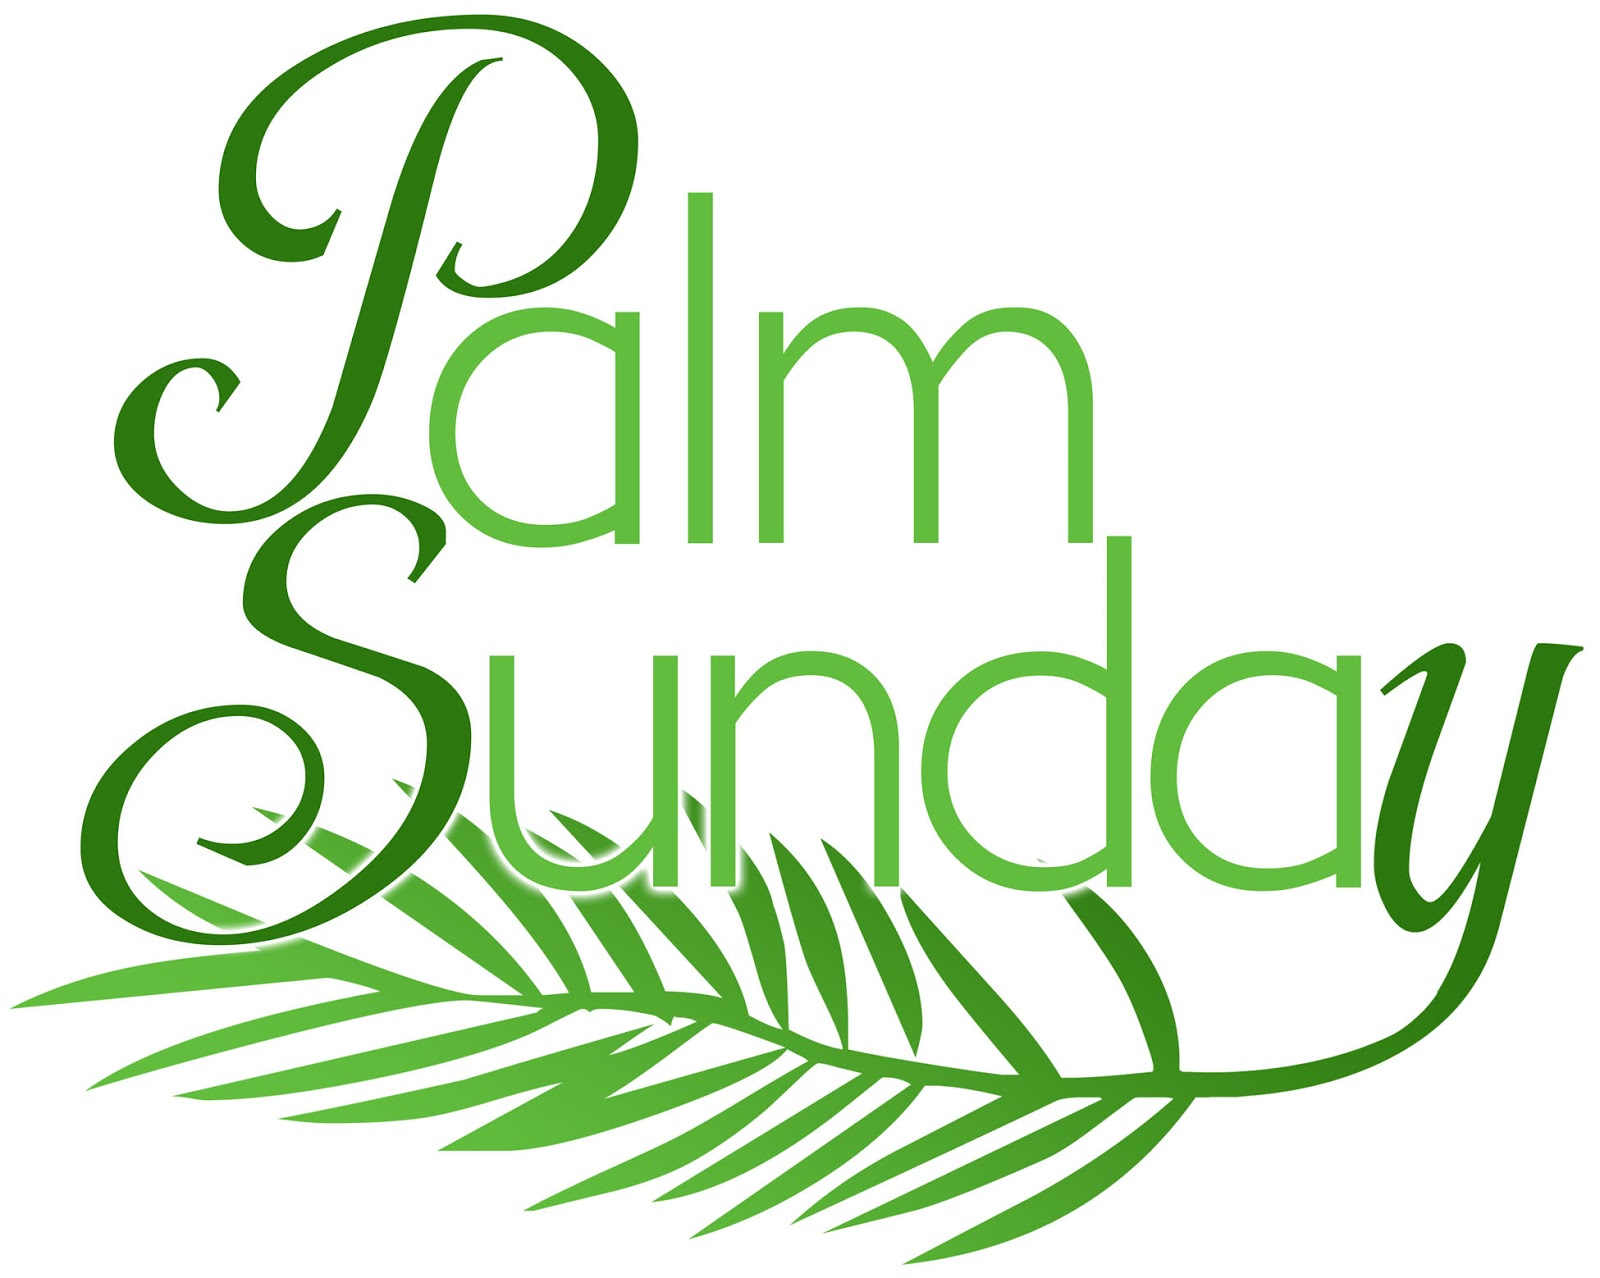 palm silhouette big island hawaii wallpapers - Palm Silhouette Big Island Hawaii Wallpapers HD